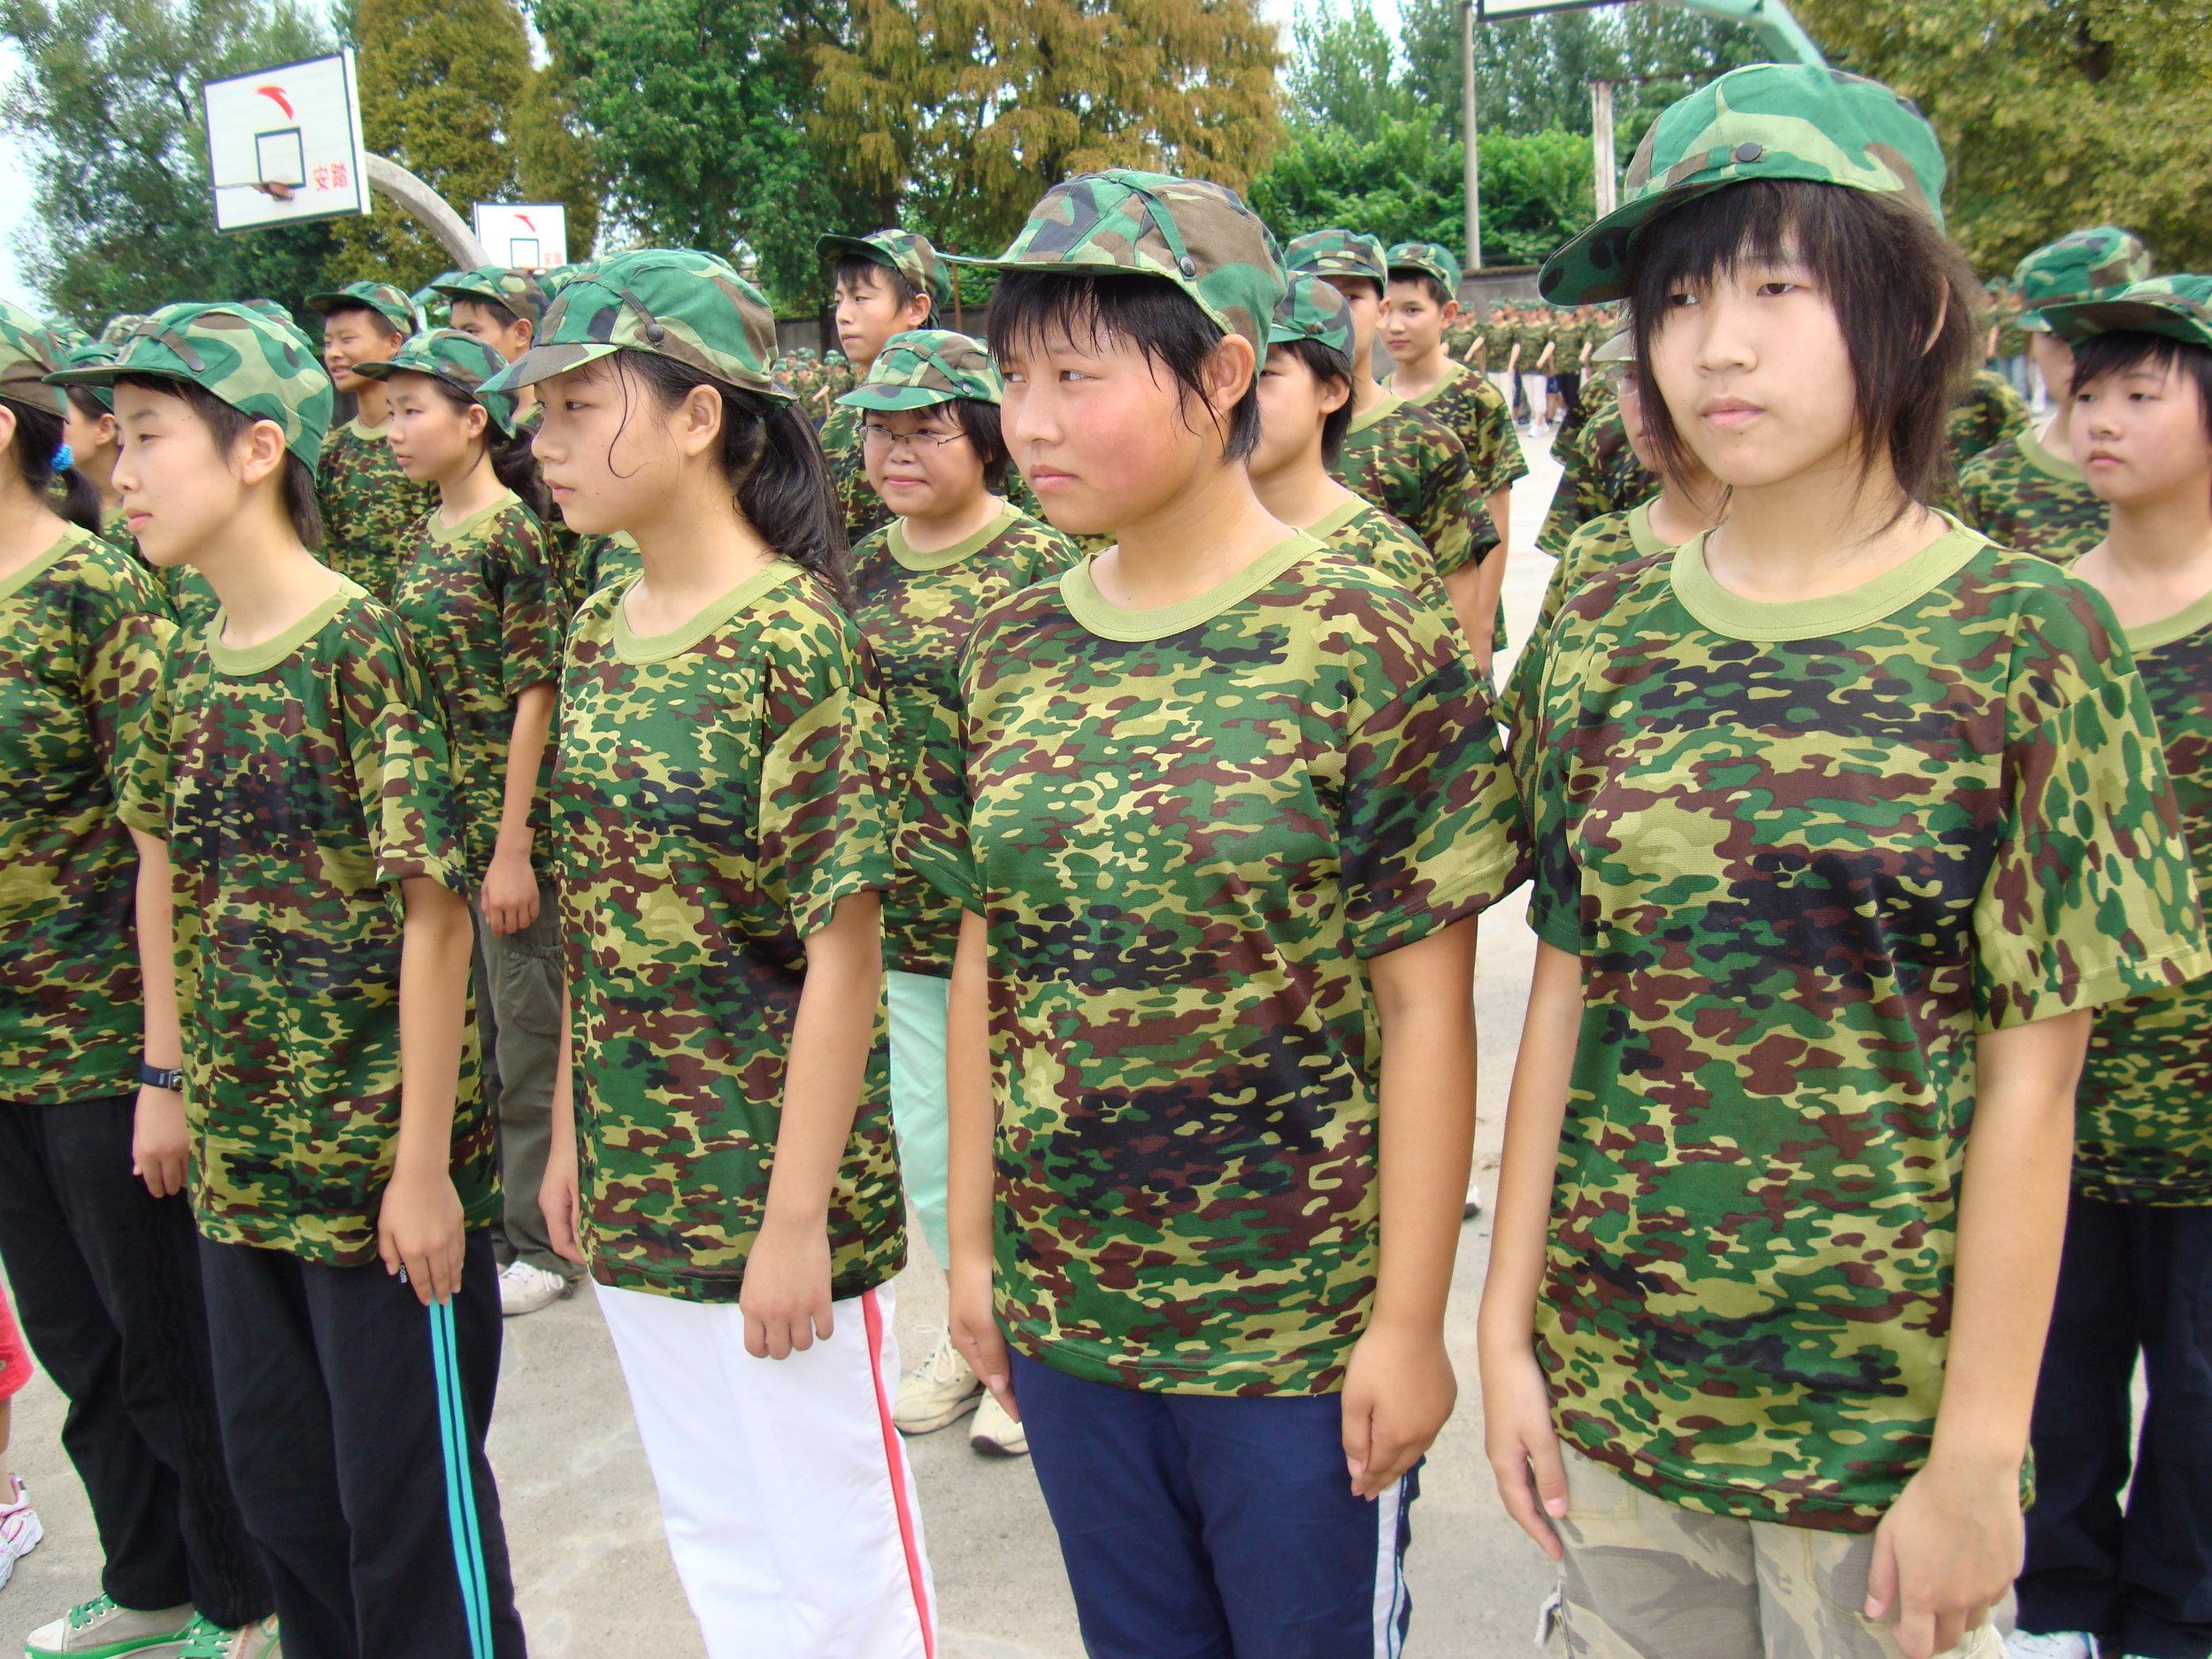 Chinese School - BBC Four. Producer/Director: Sarah Hamilton. Production Company: Lion Television